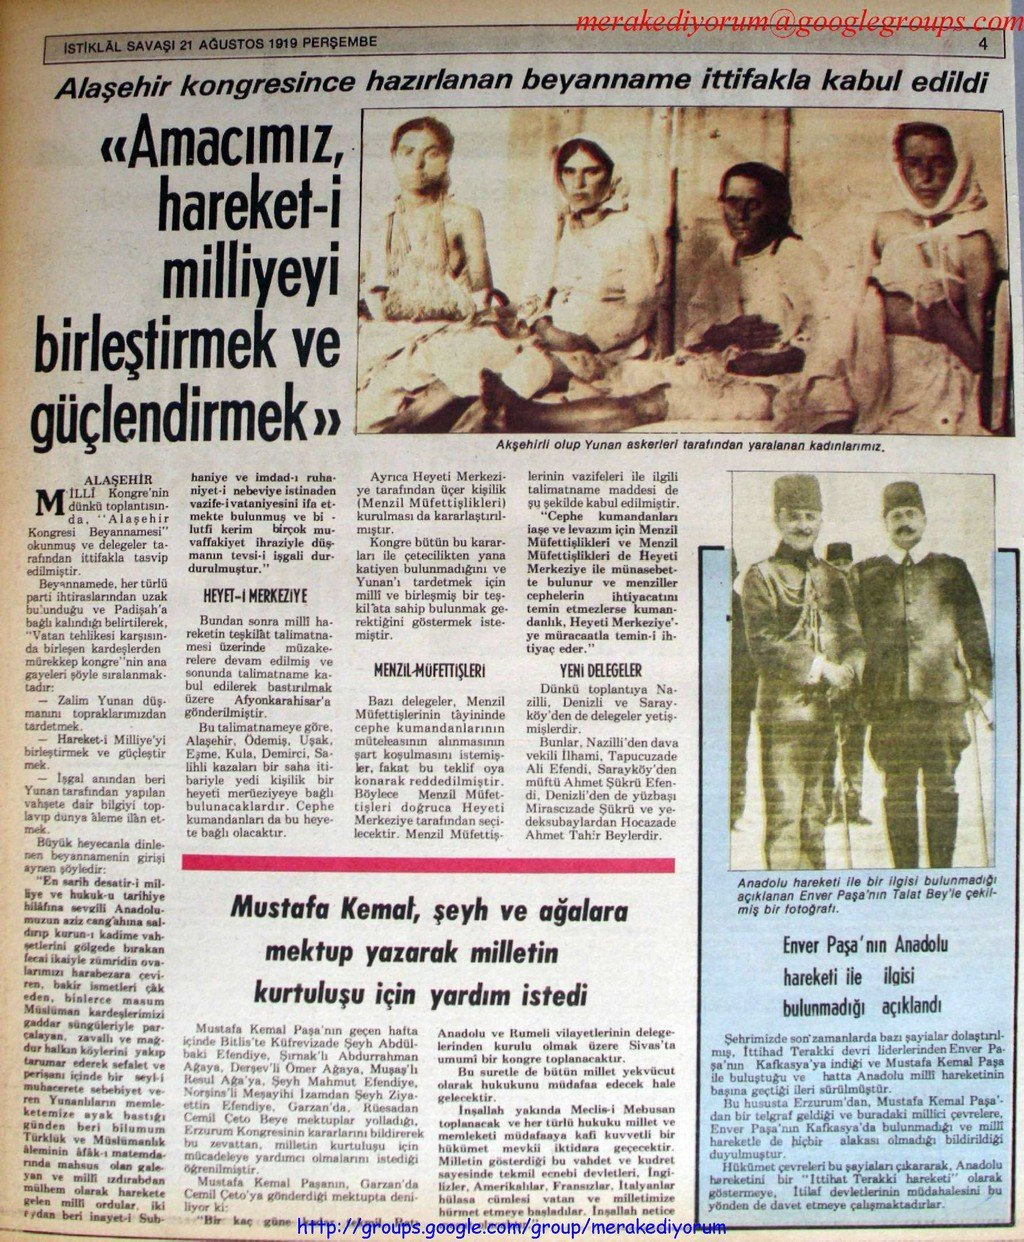 istiklal savaşı gazetesi - 21 ağustos 1919